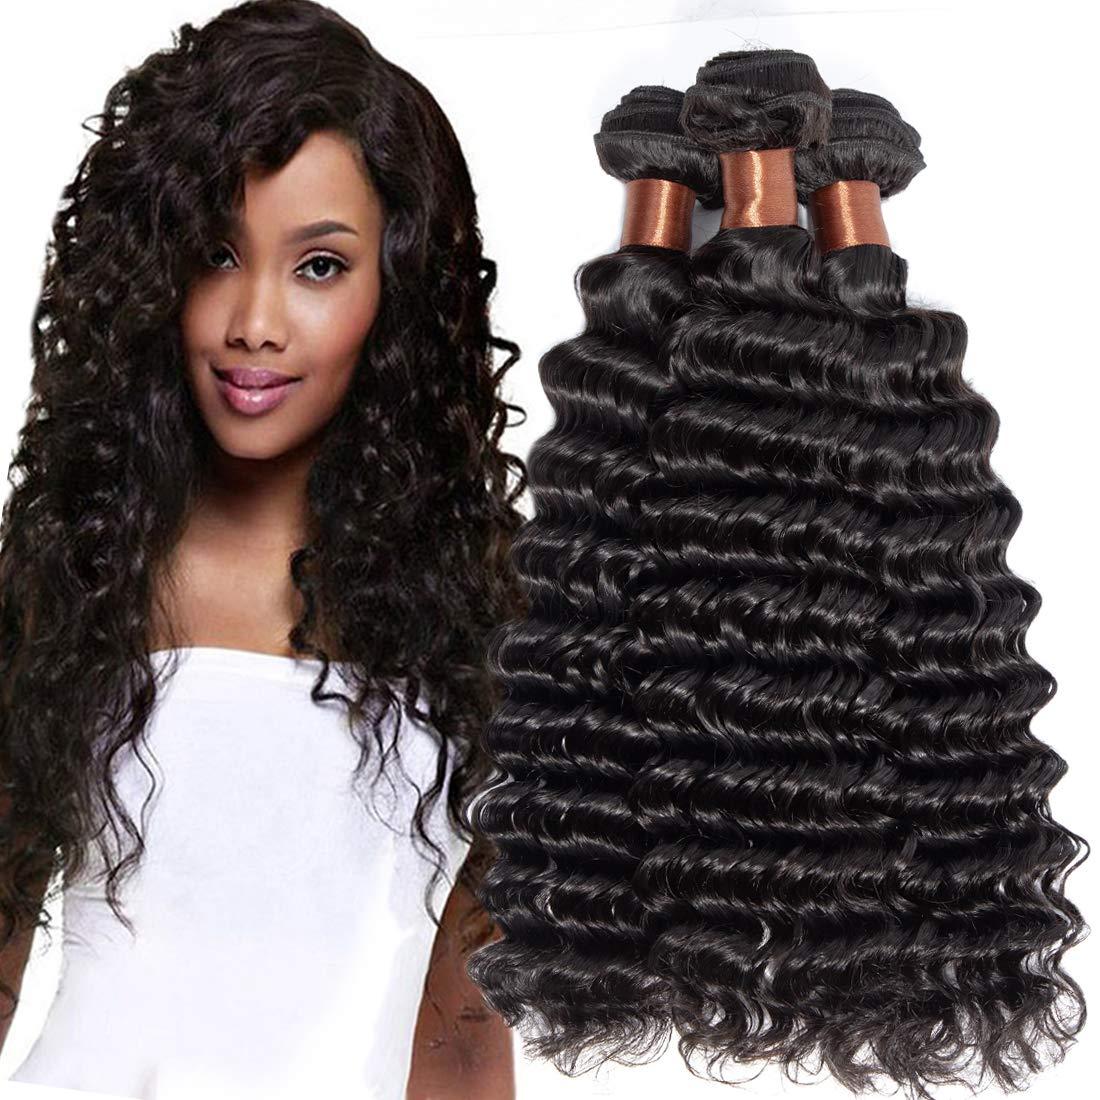 Free shipping / New ANGIE QUEEN Hair Peruvian Virgin Deep Bundles Wave OFFicial mail order 3 18 20